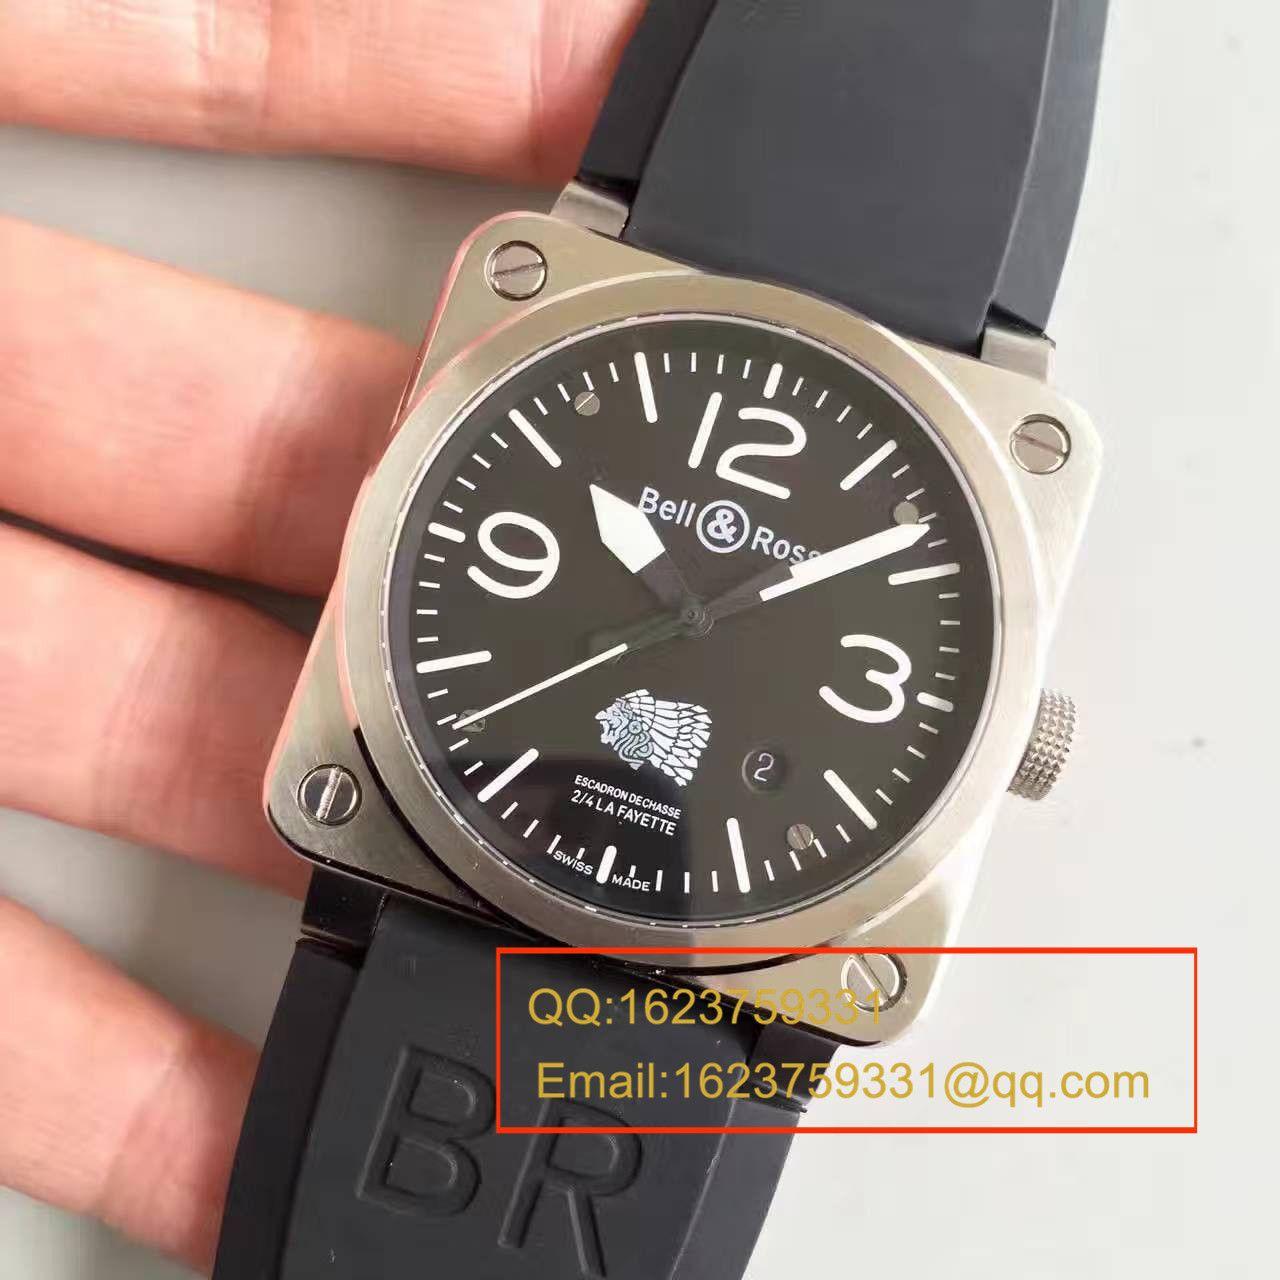 【BR厂一比一复刻手表】柏莱仕美军指定军表品牌印地安人头像 专属特别版腕表 BR03-92 / BLS013